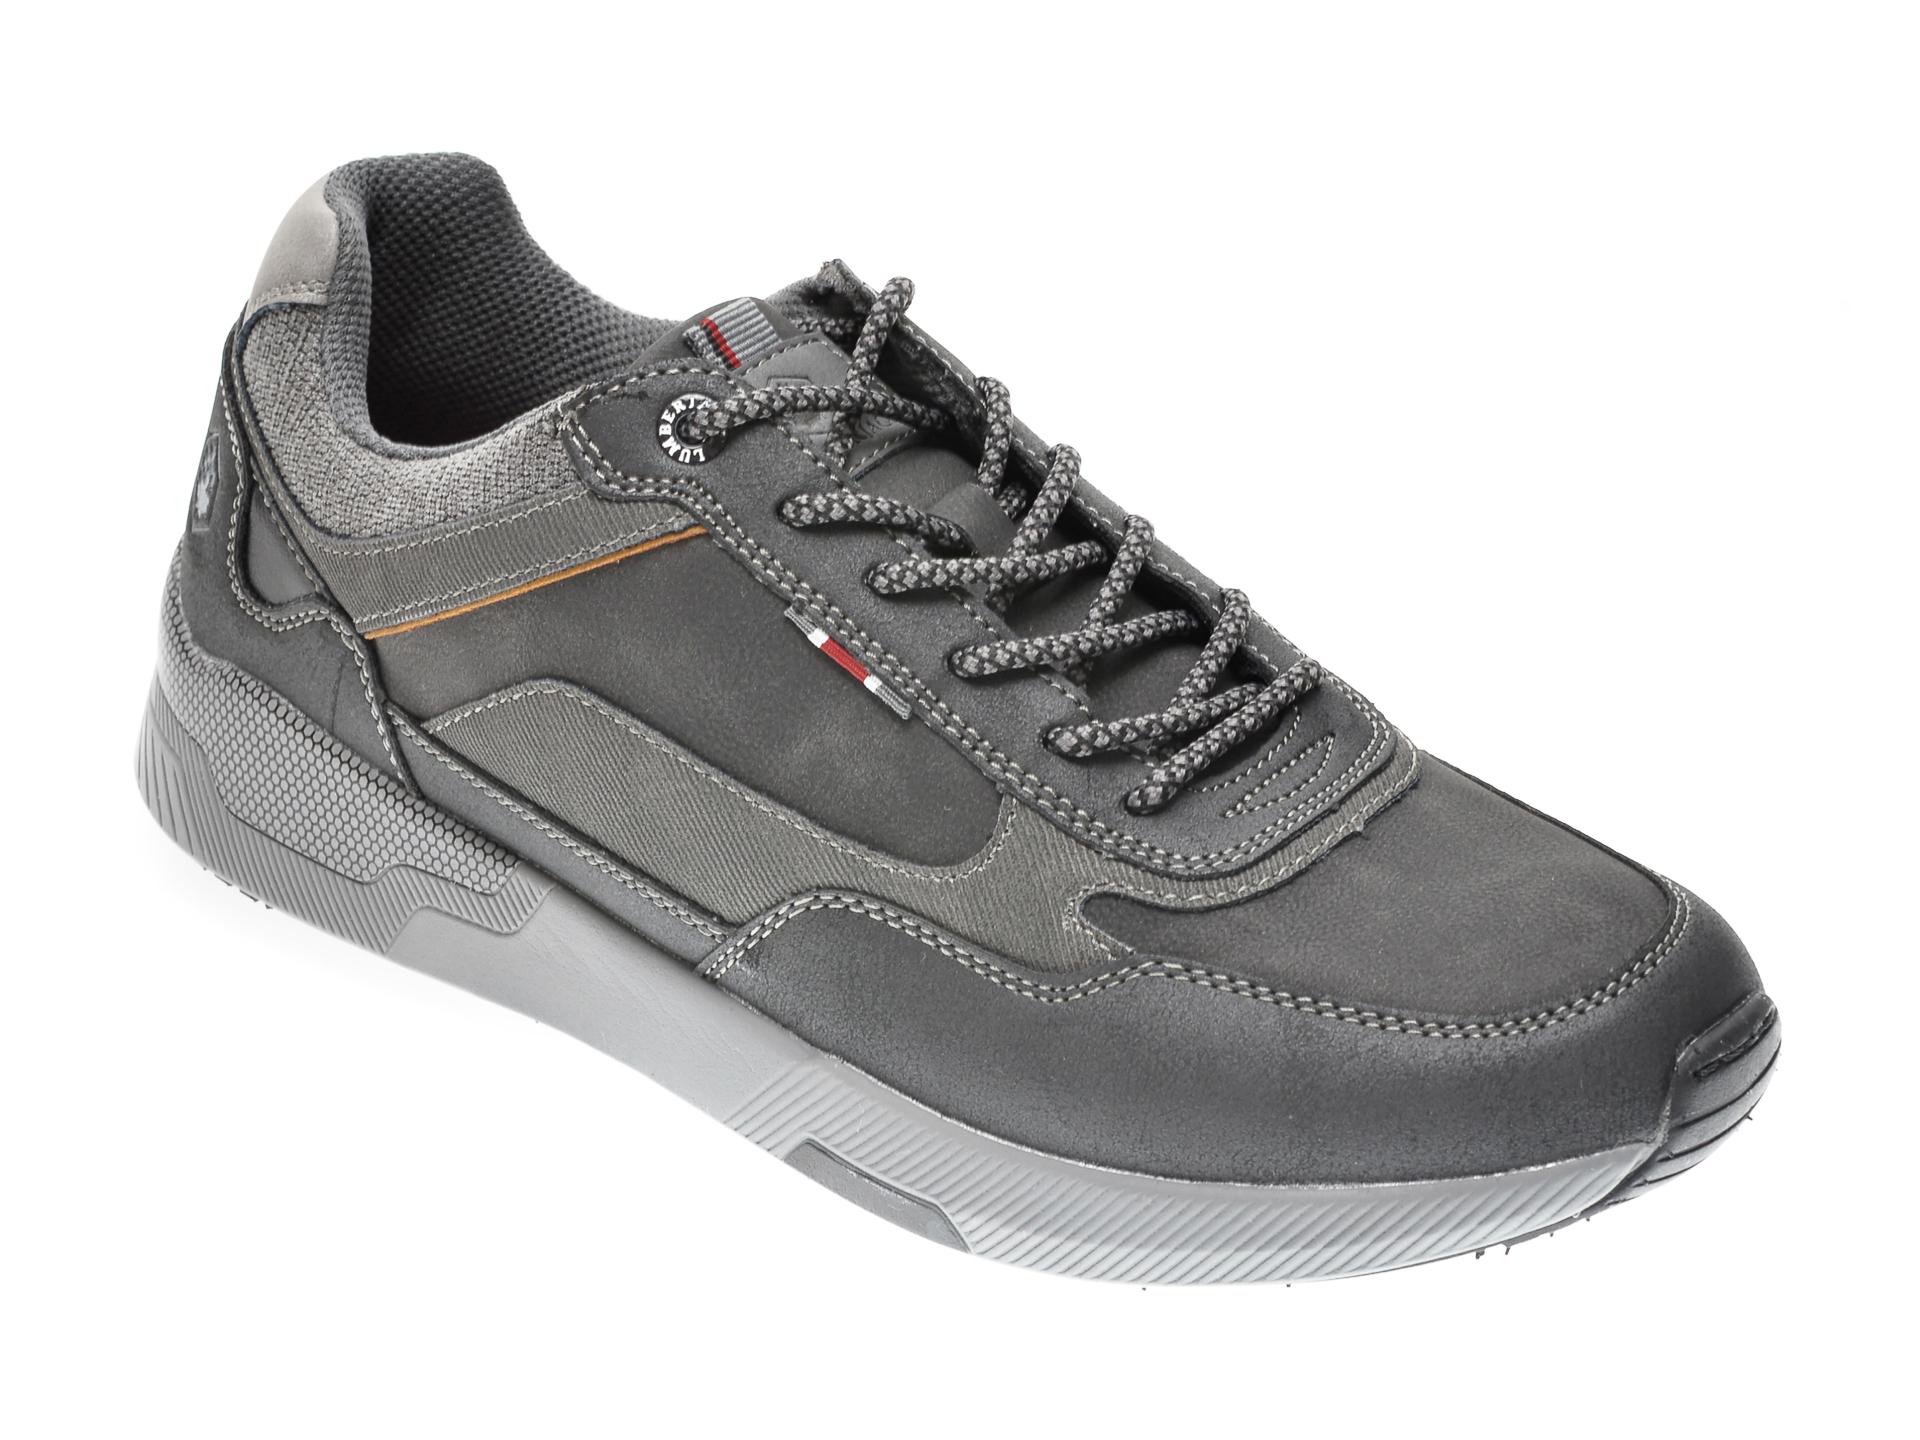 Pantofi sport LUMBERJACK negri, 412004, din piele ecologica imagine